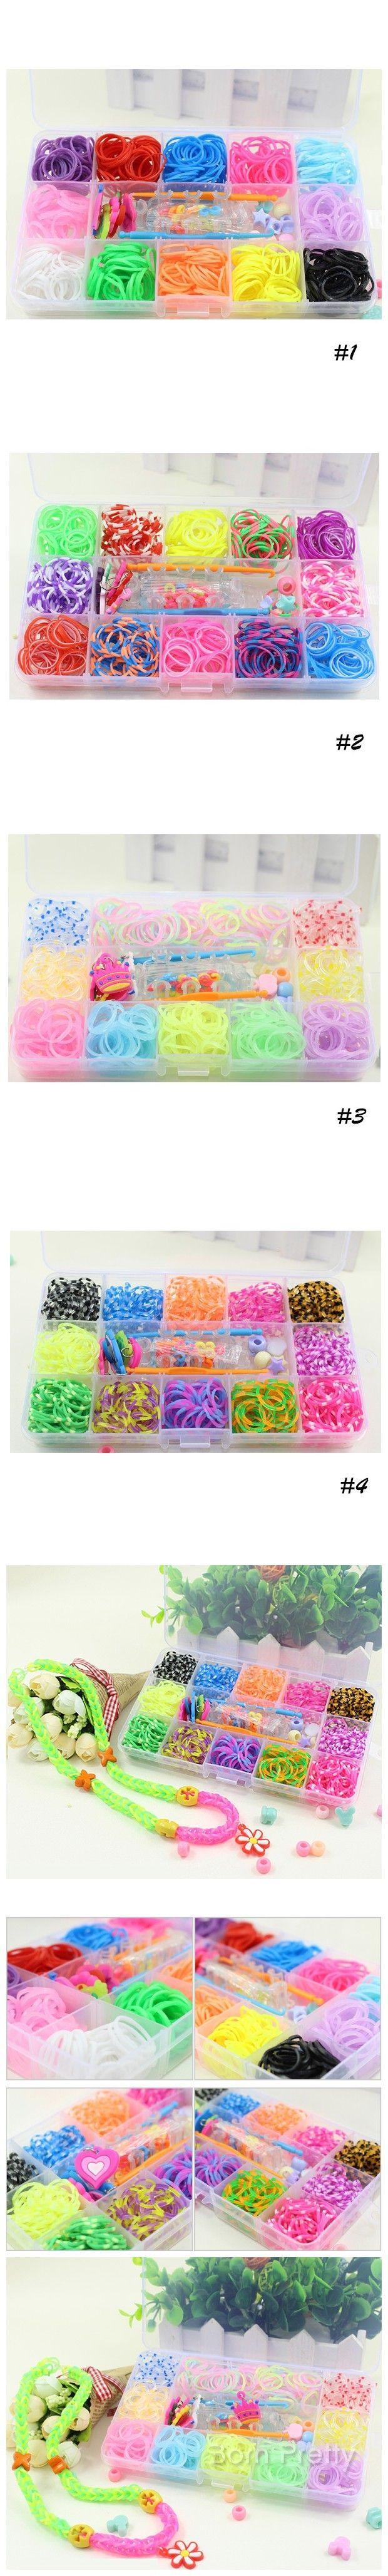 $9.19 Colorful Mini Rubber Hair Band Fashionable Knitting Bracelete DIY - BornPrettyStore.com